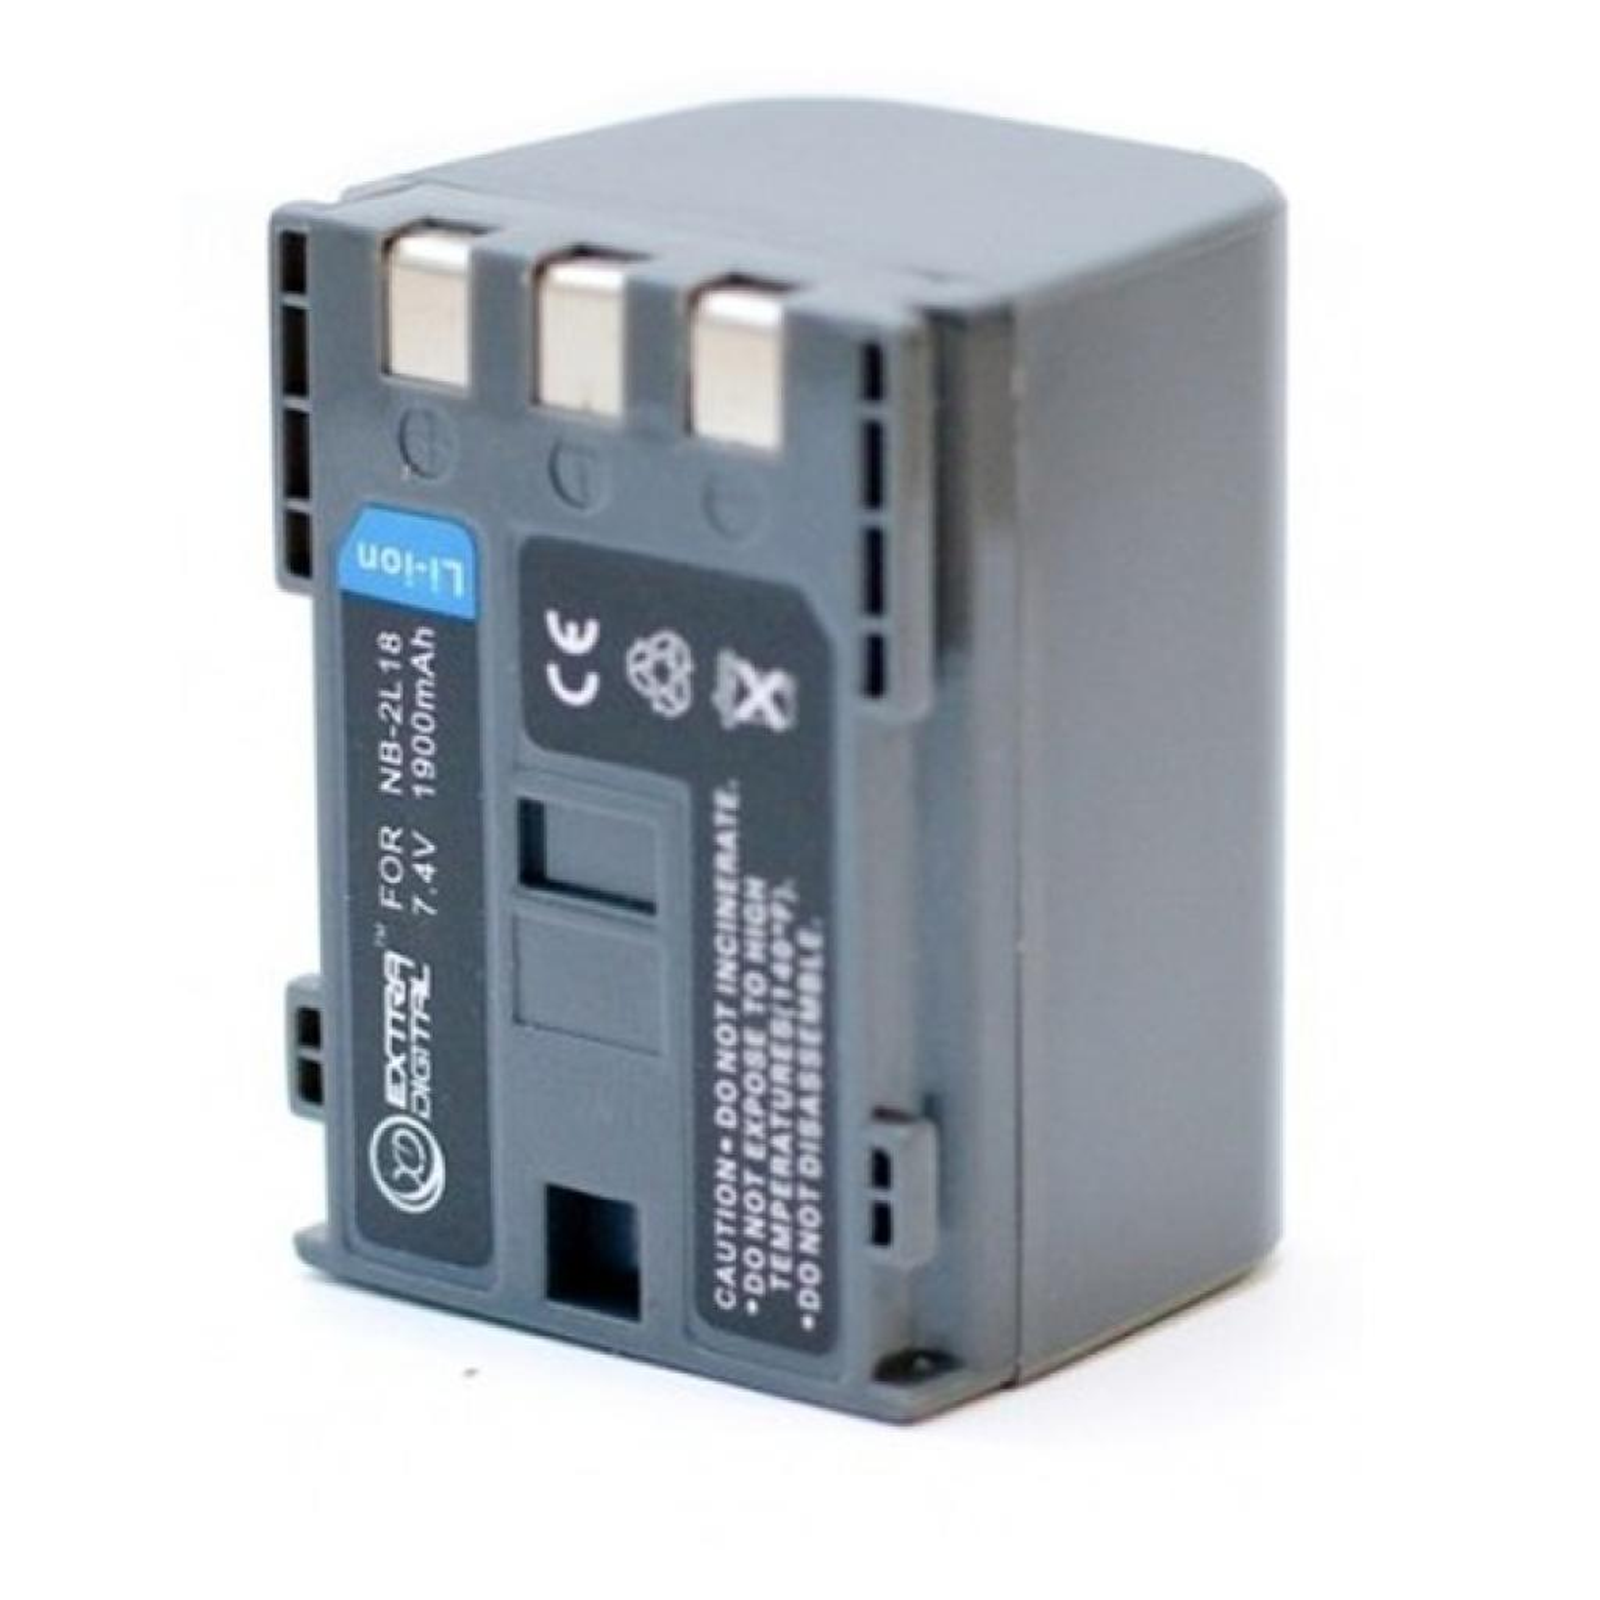 Аккумулятор к фото/видео EXTRADIGITAL Canon NB-2L18 (DV00DV1074) изображение 2